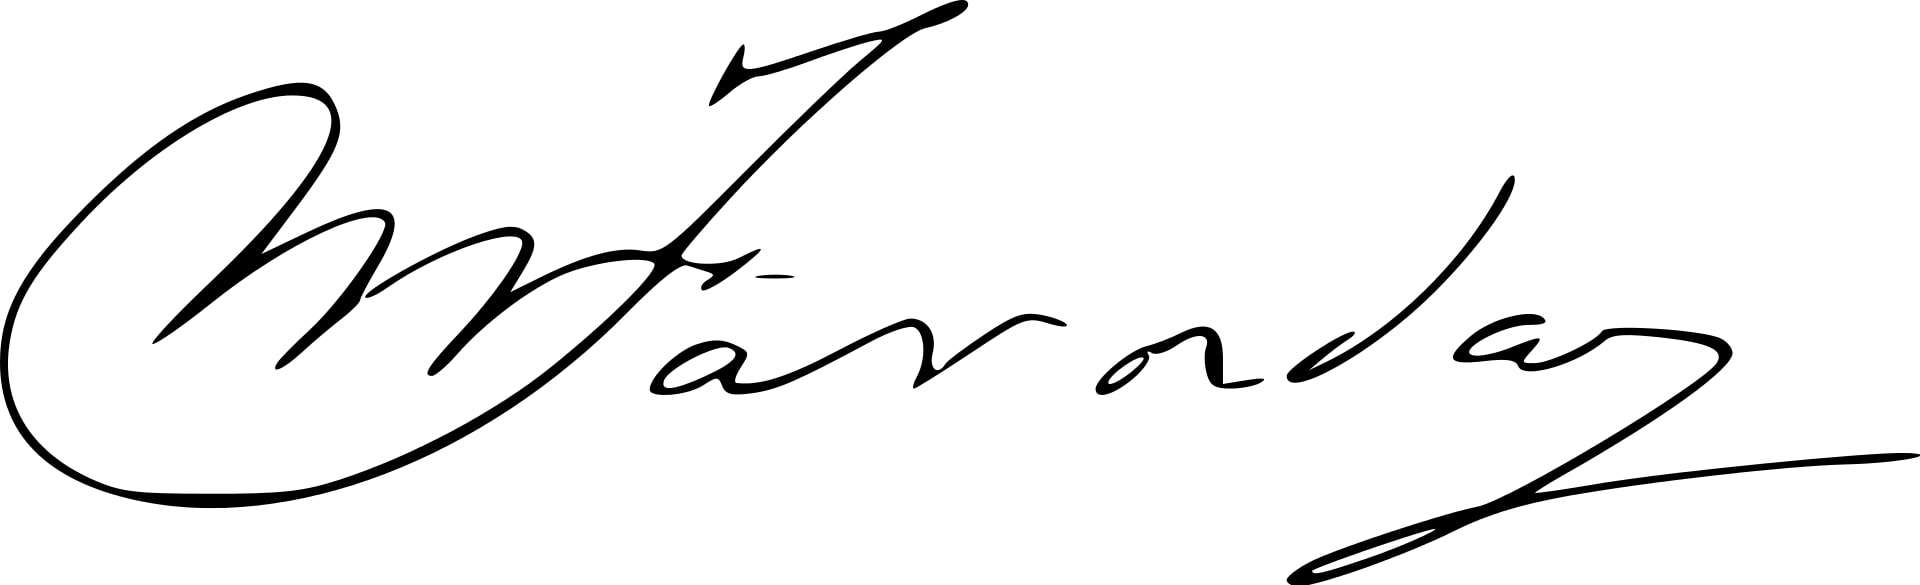 Michael Faraday Signature